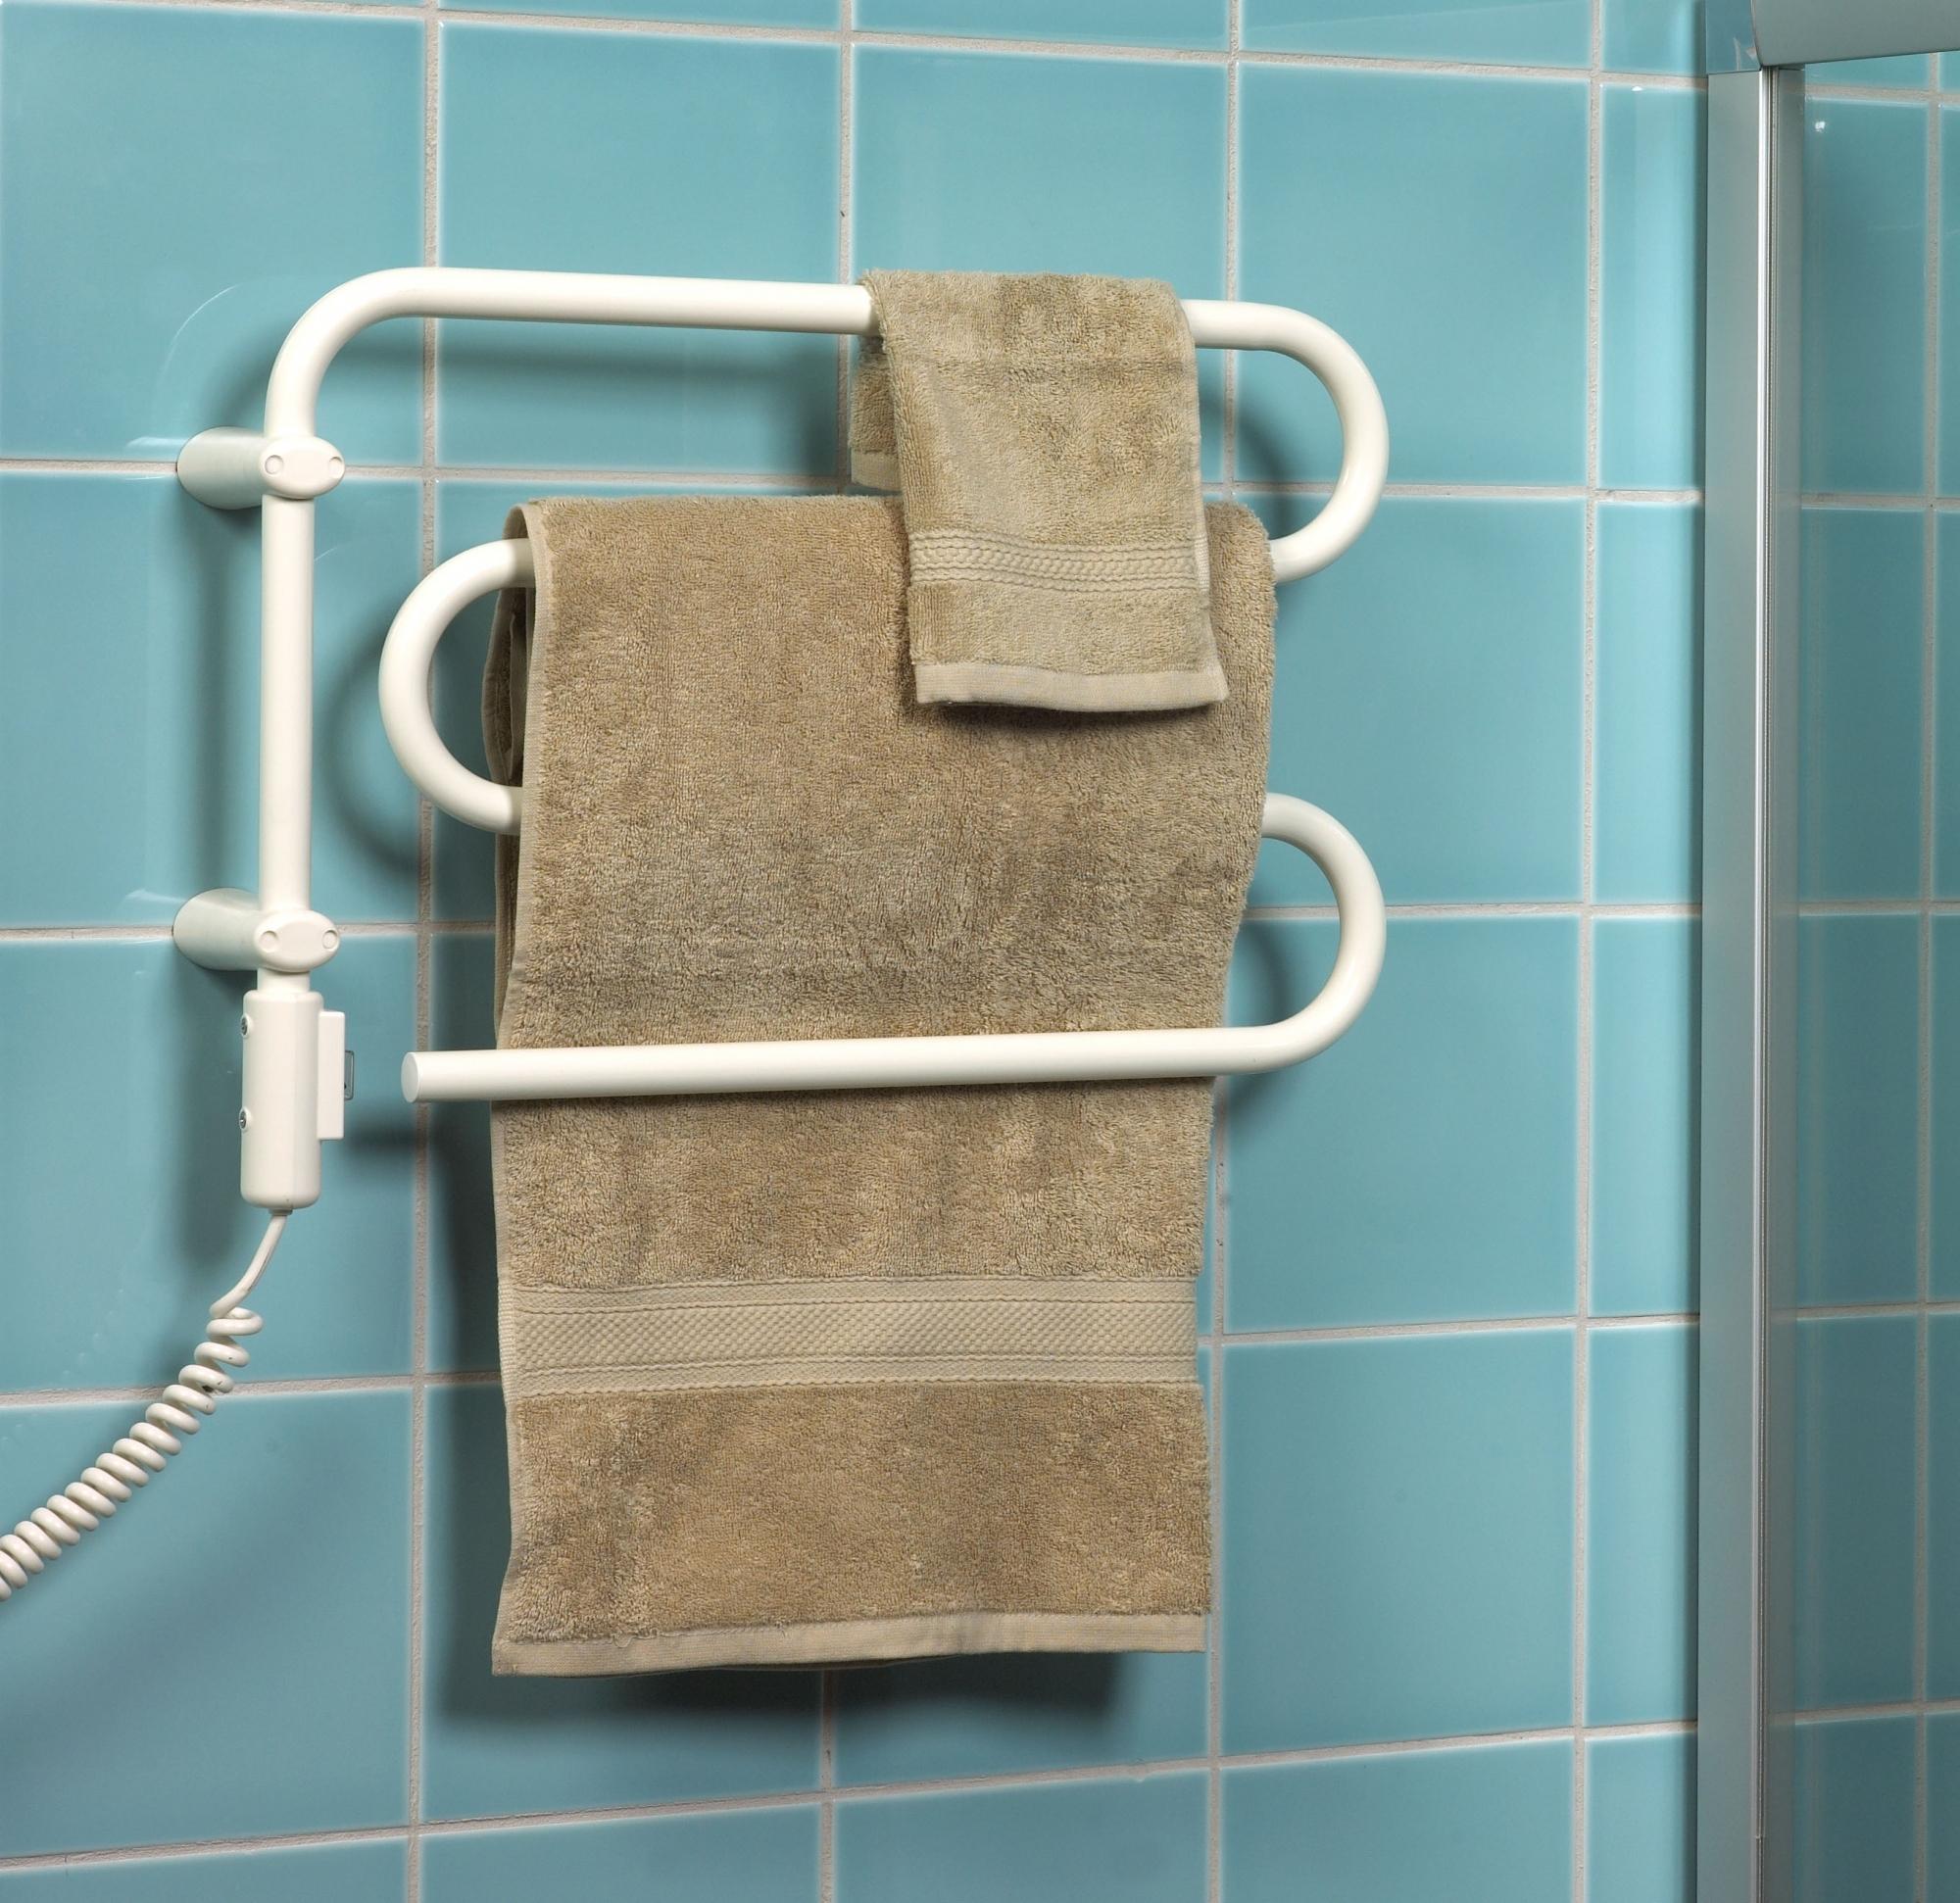 Sharndy Etw84 4 Electric Towel Warmers Dryer Rack Wall: Towel Image JardImage.co